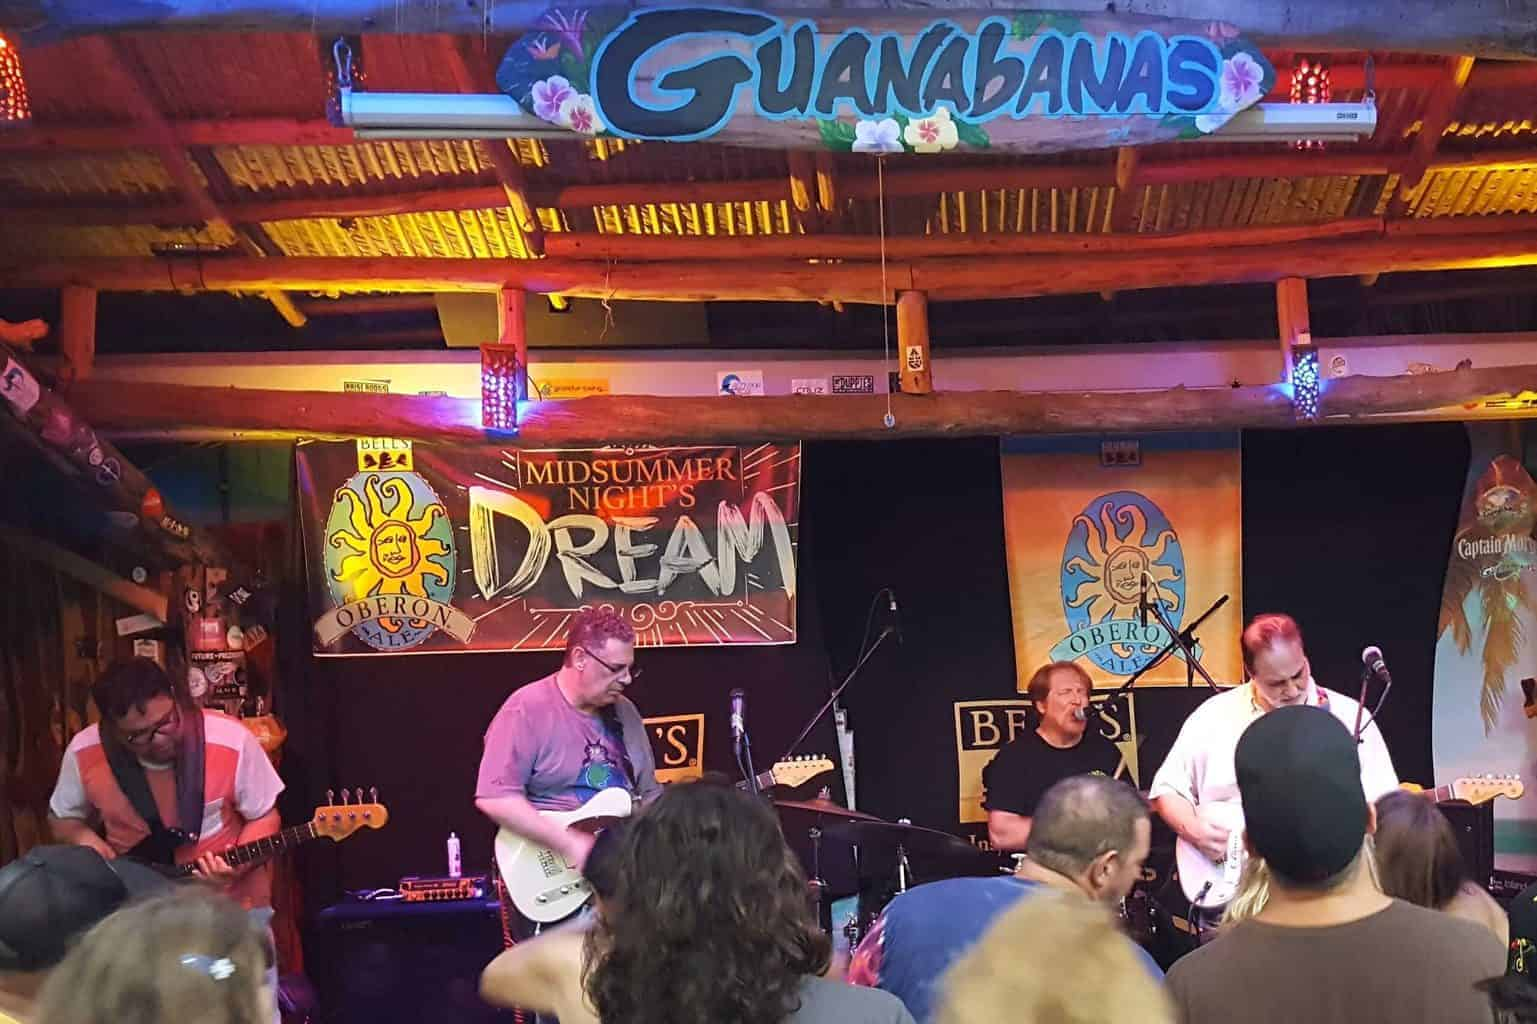 Unlimited Devotion (Tribute - Grateful Dead) at Guanabanas